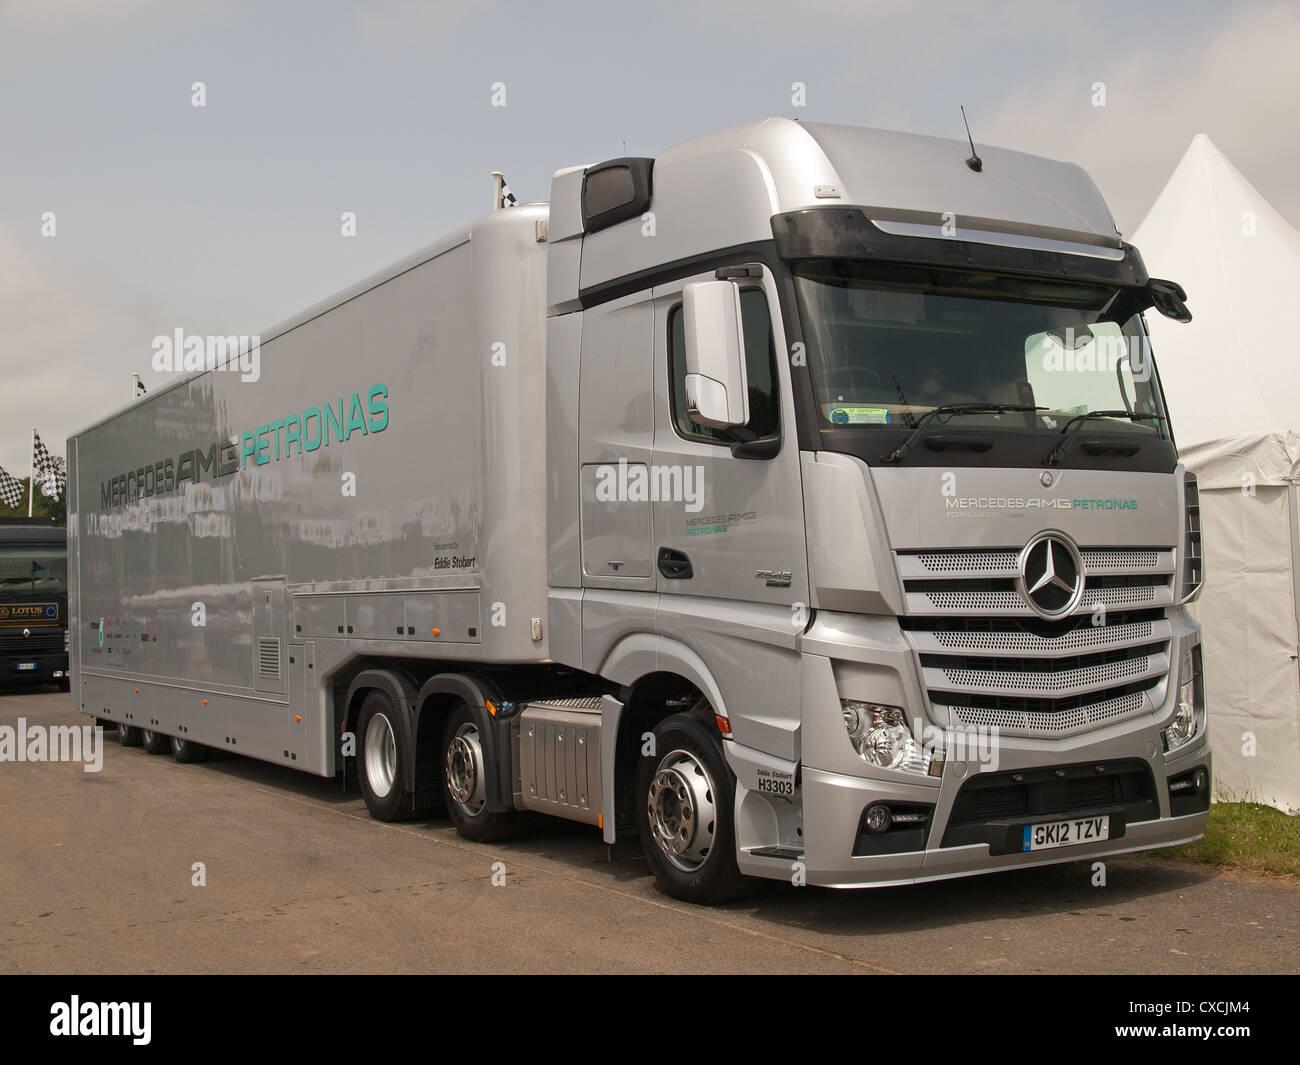 hight resolution of mercedes amg petronas team f1 truck goodwood festival of speed england uk 2012